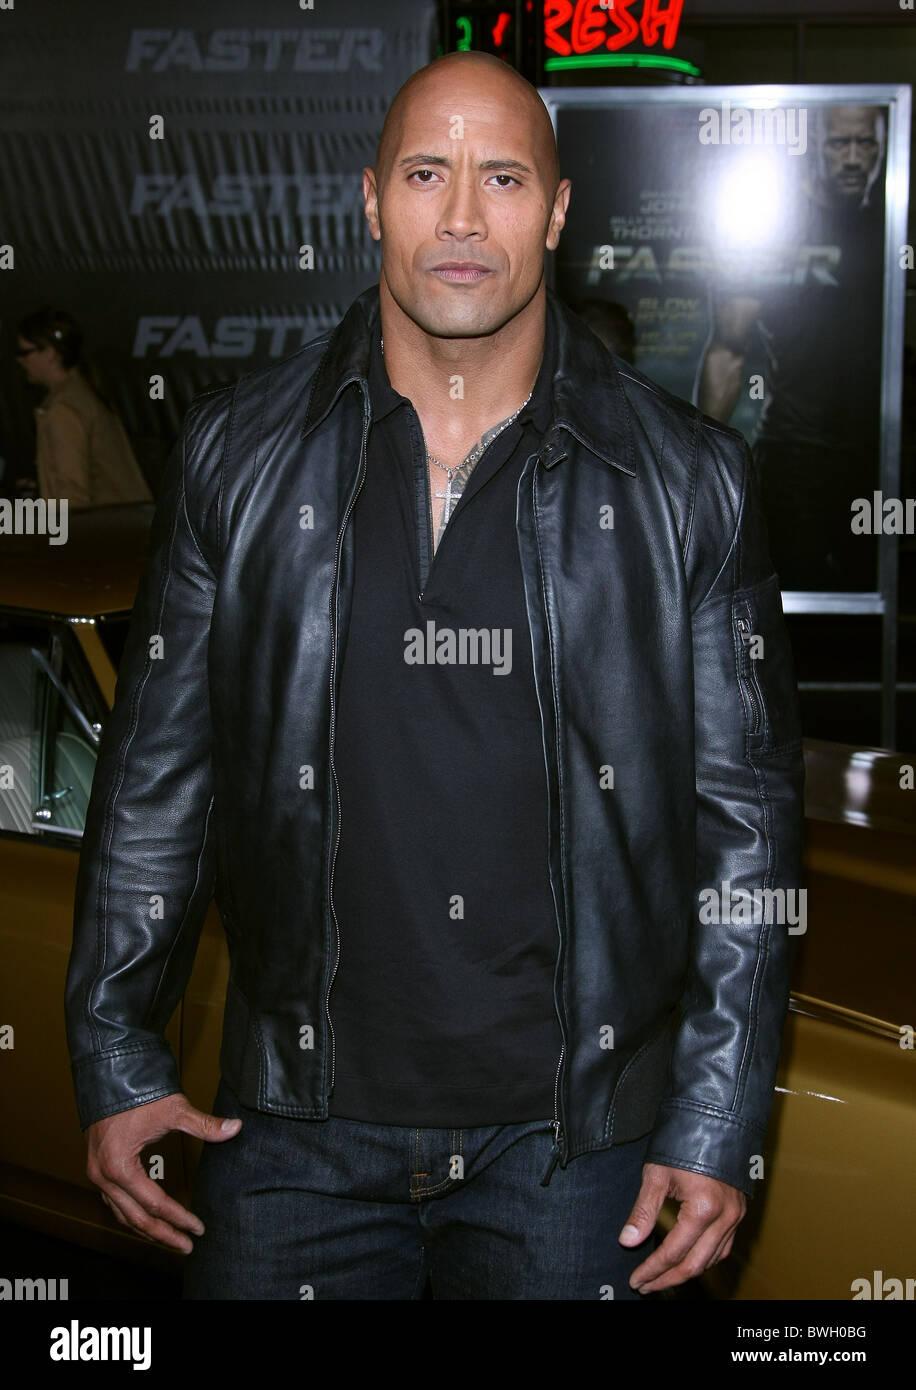 13e4114f9 DWAYNE JOHNSON AKA THE ROCK FASTER CBS FILMS PREMIERE HOLLYWOOD LOS ...